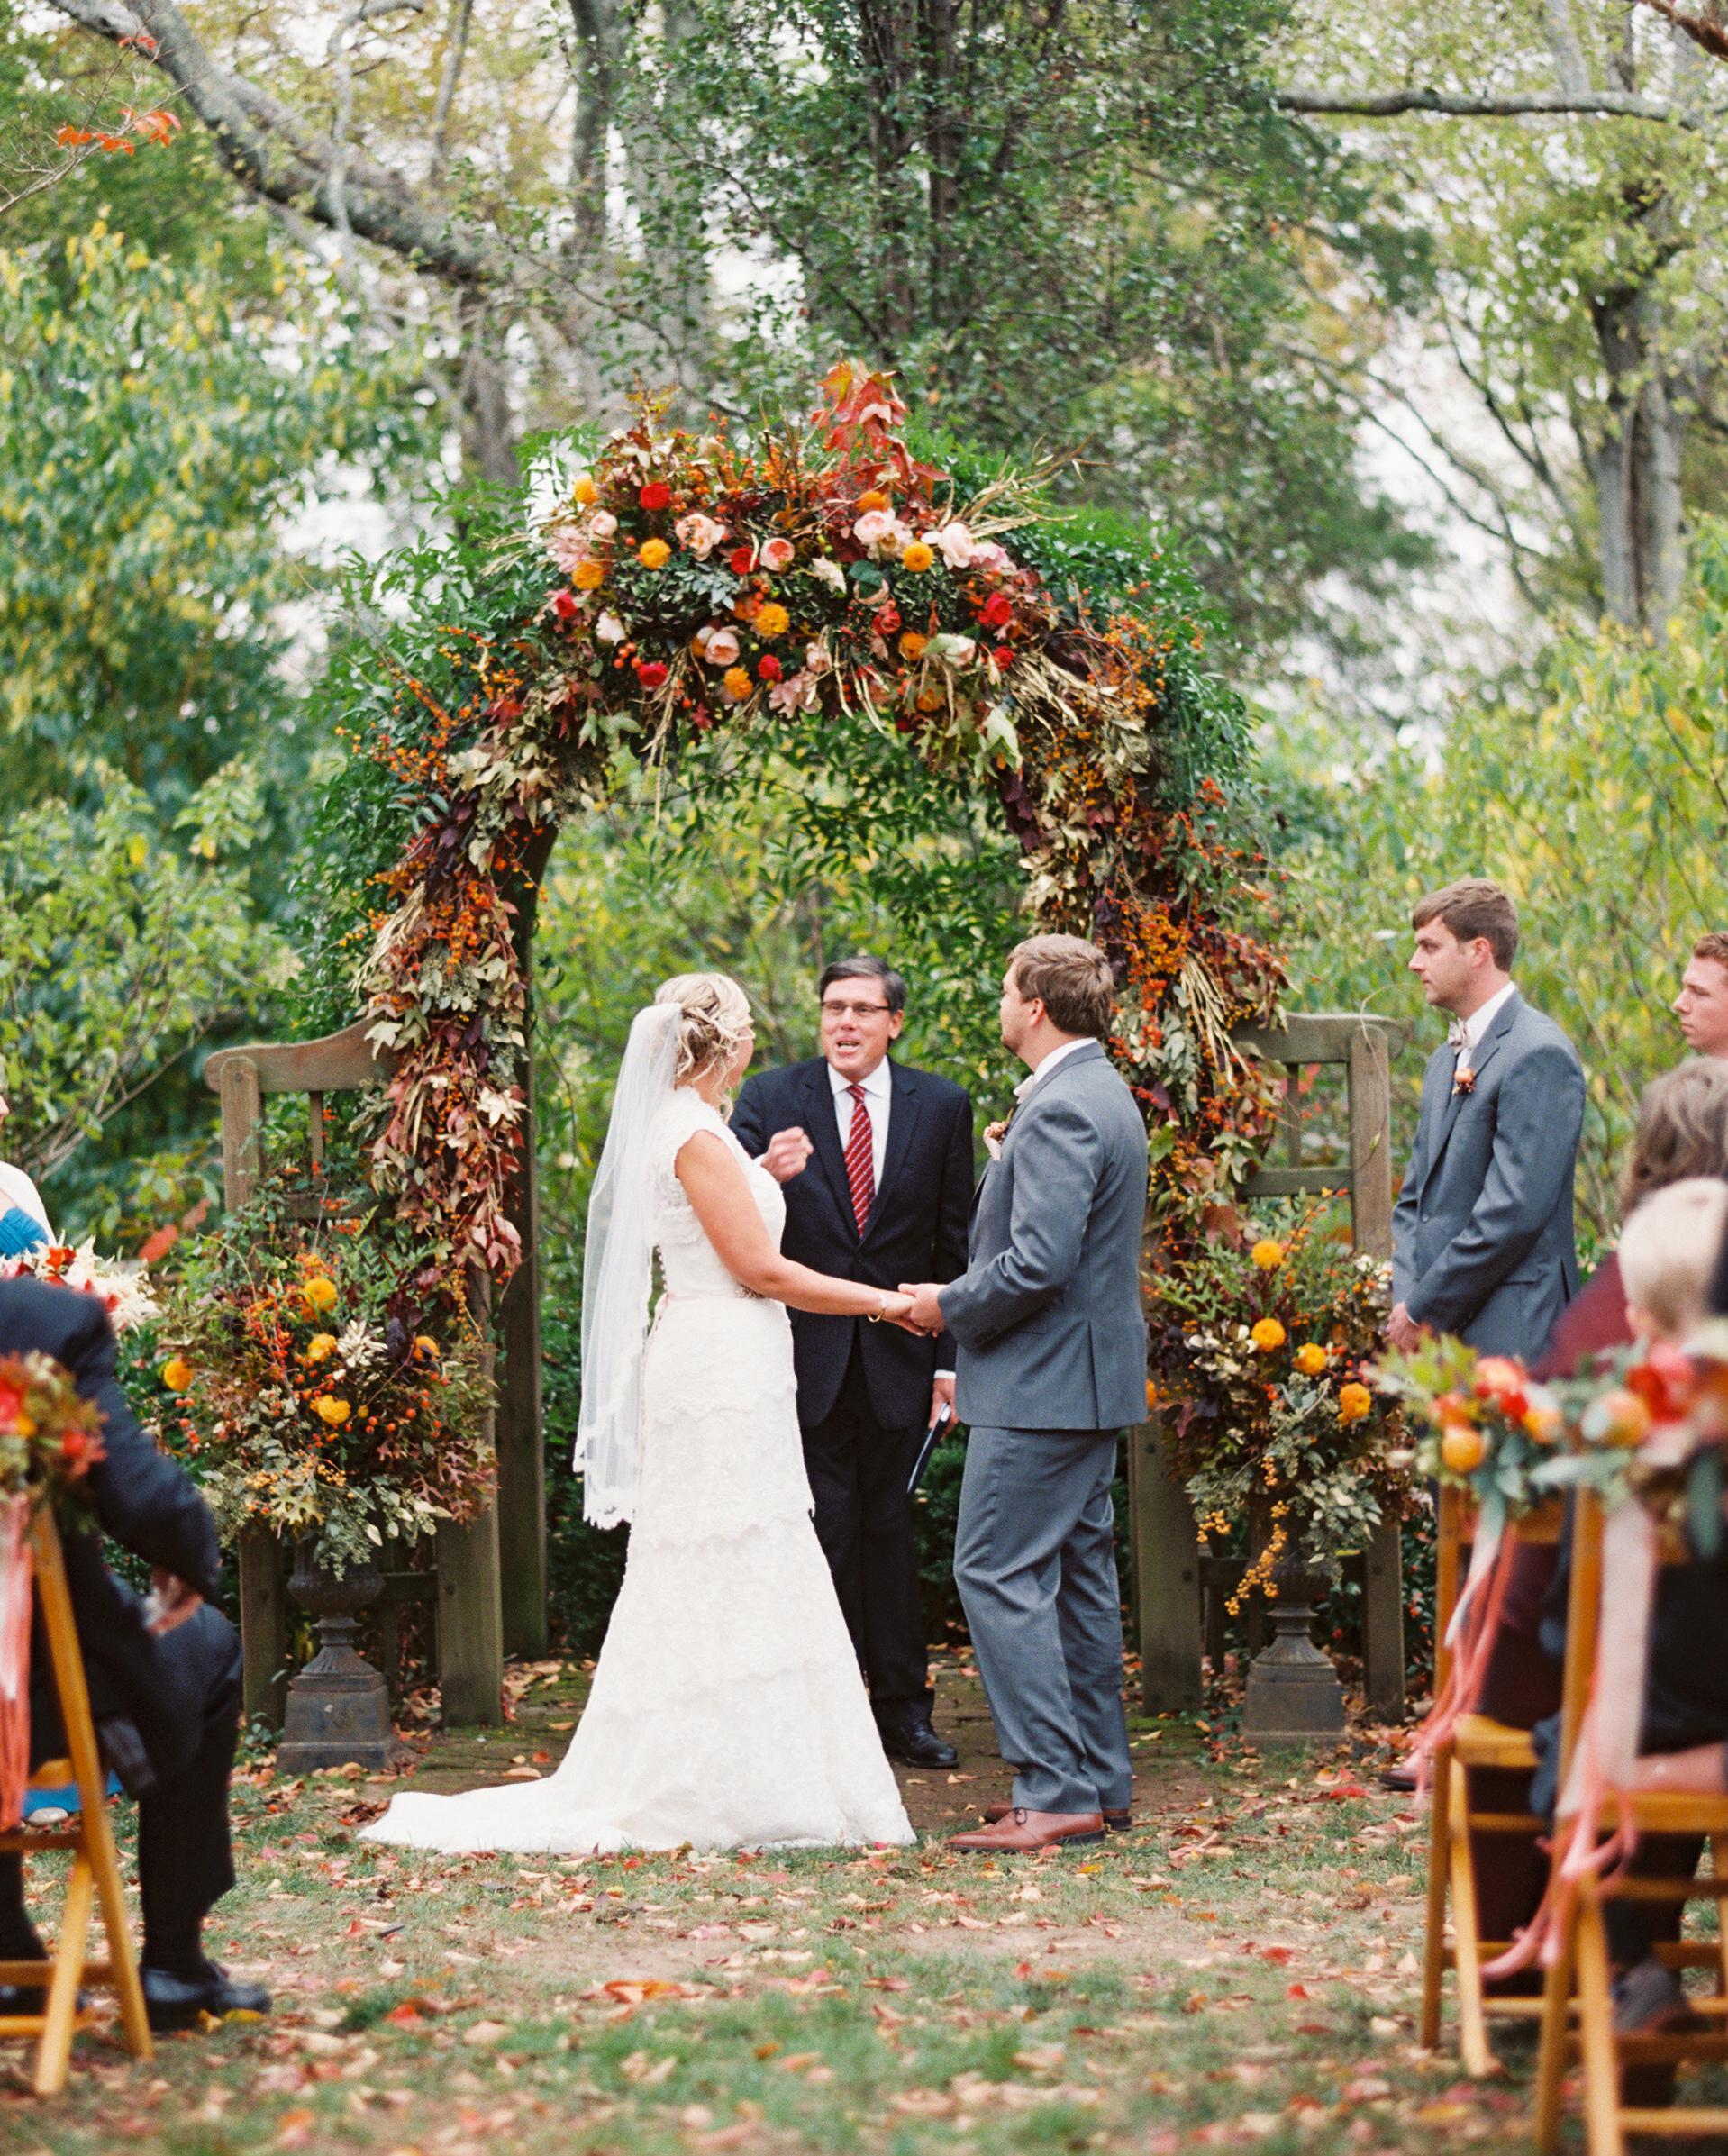 brittany-andrew-wedding-ceremony-057-s112067-0715.jpg